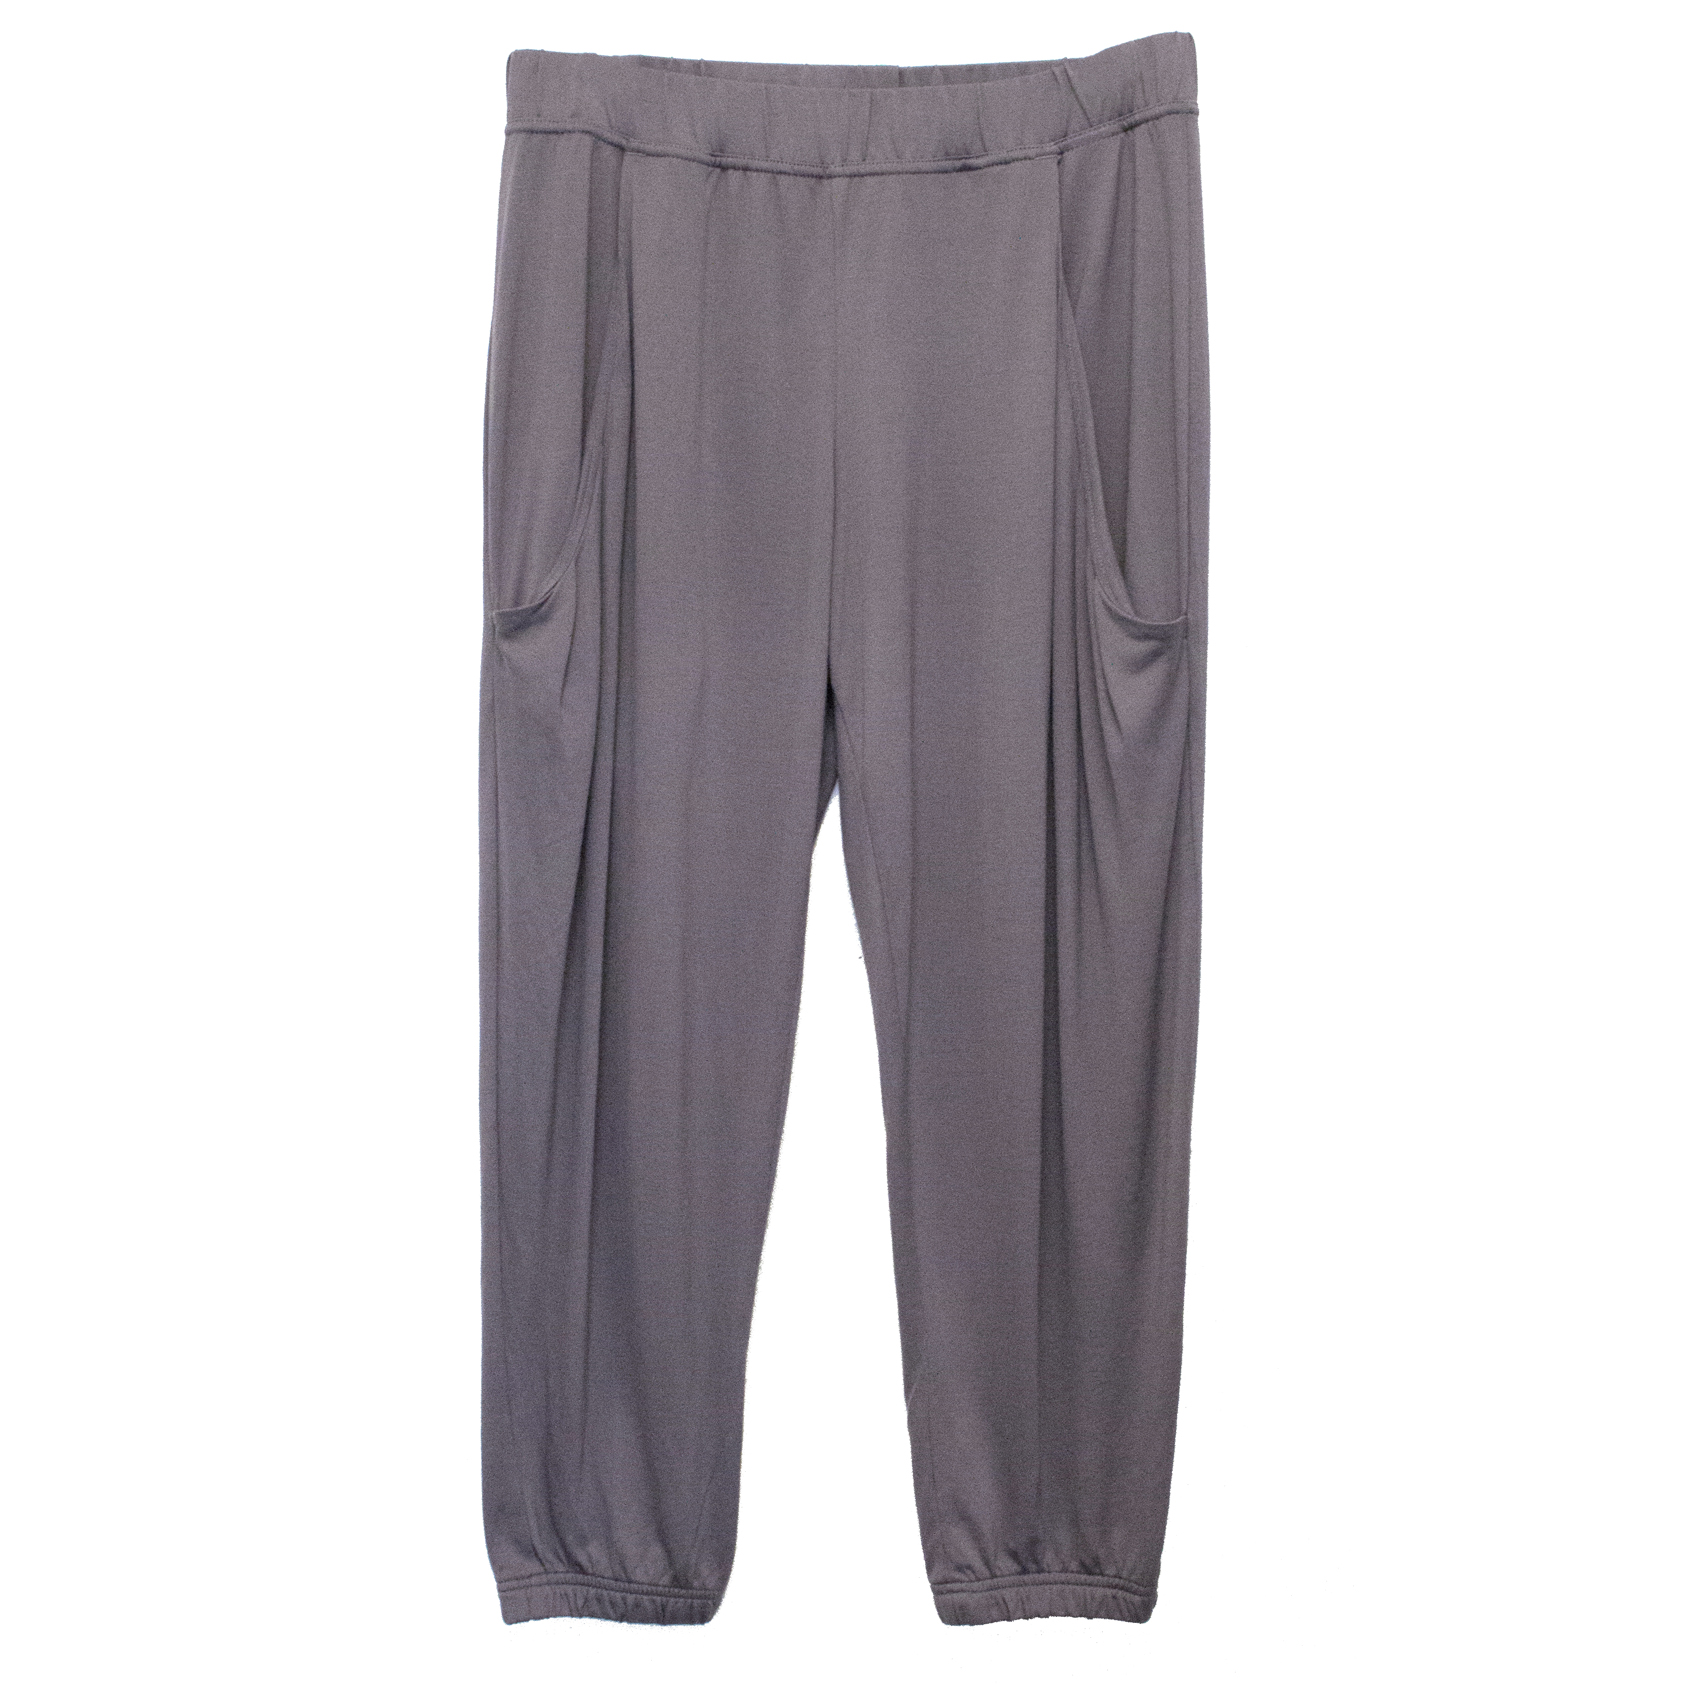 Stella McCartney Jogging Pants